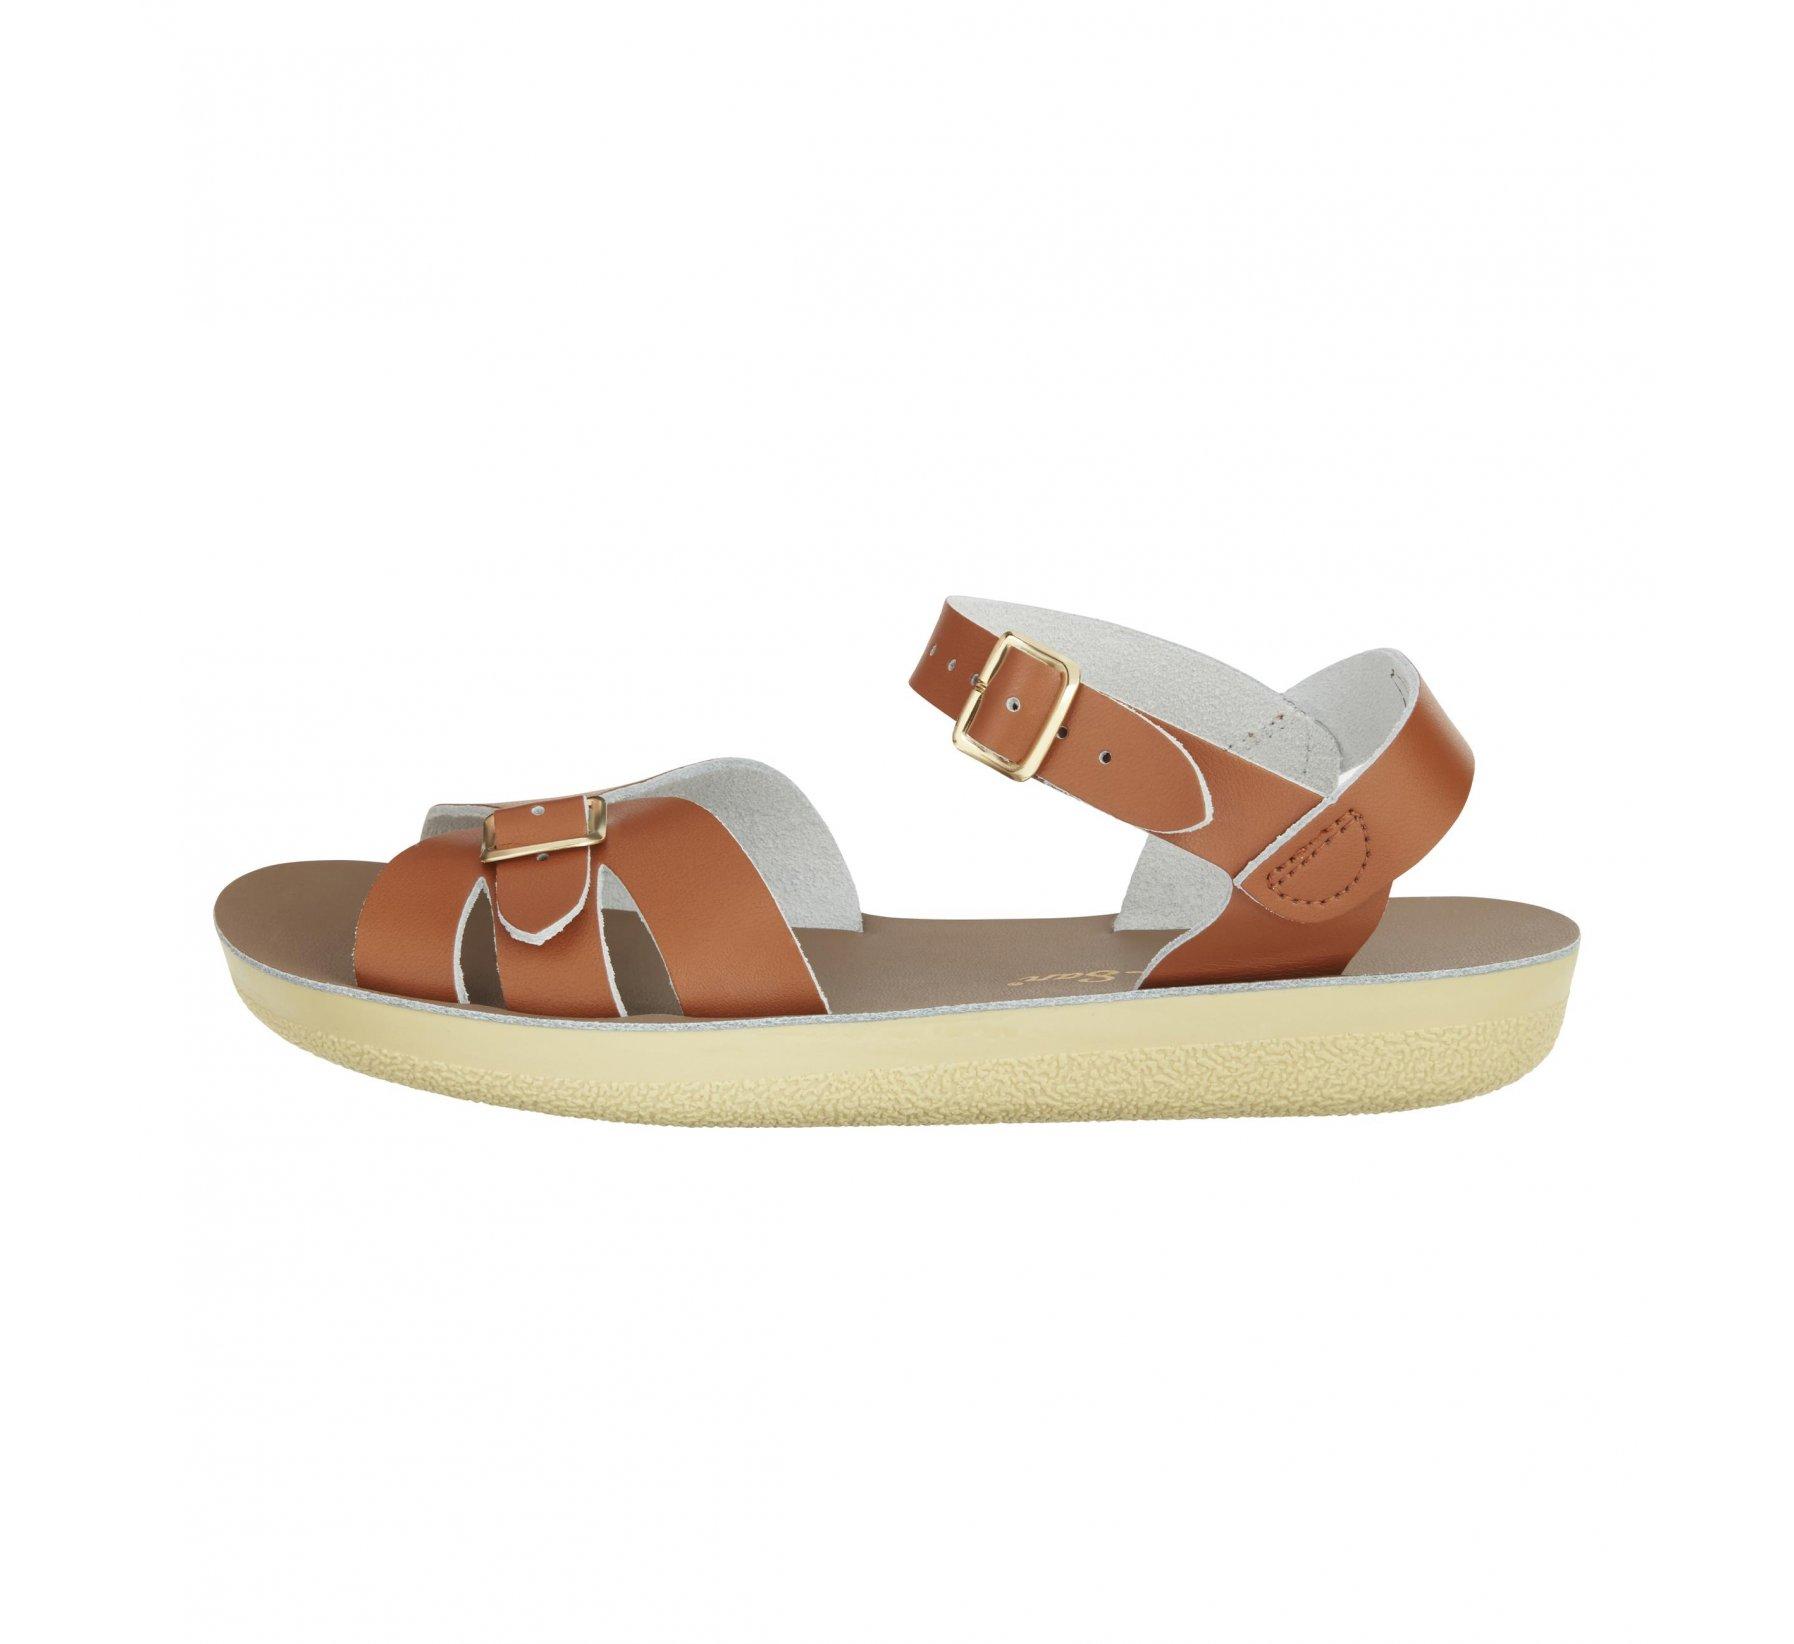 Boardwalk Tan - Salt Water Sandals